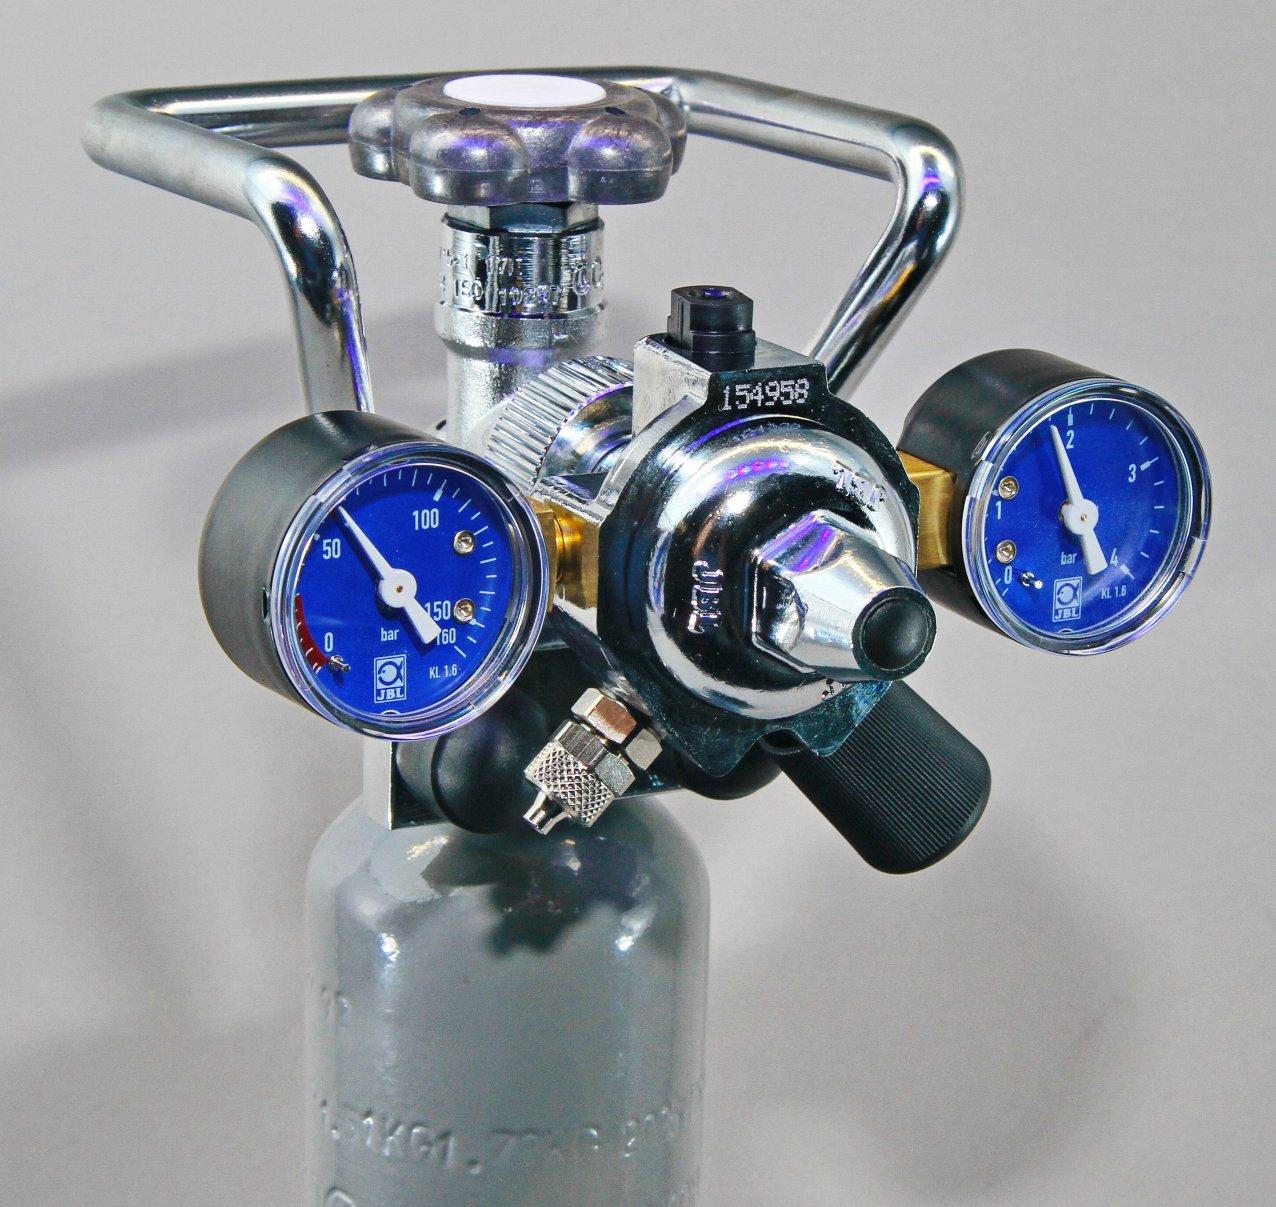 JBL ProFlora m001 CO2 pressure regulator